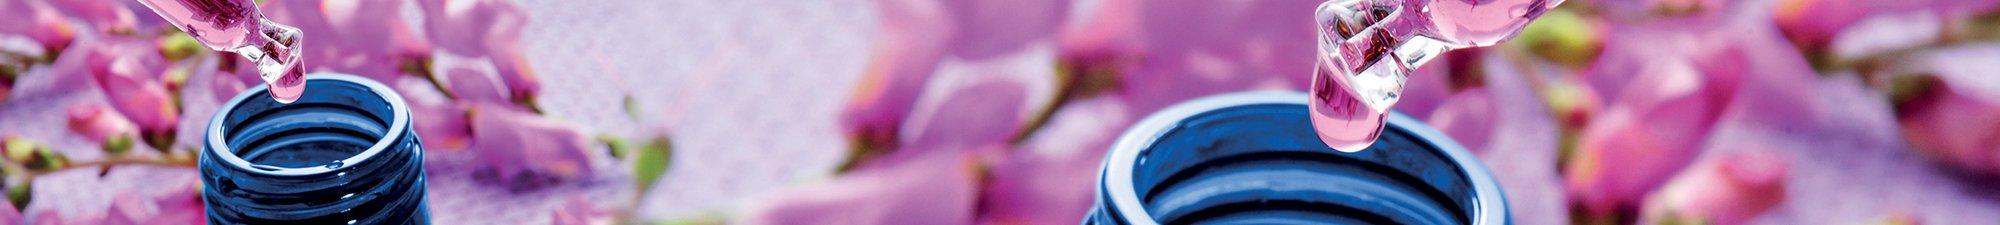 eteriska oljor, aromaterapi